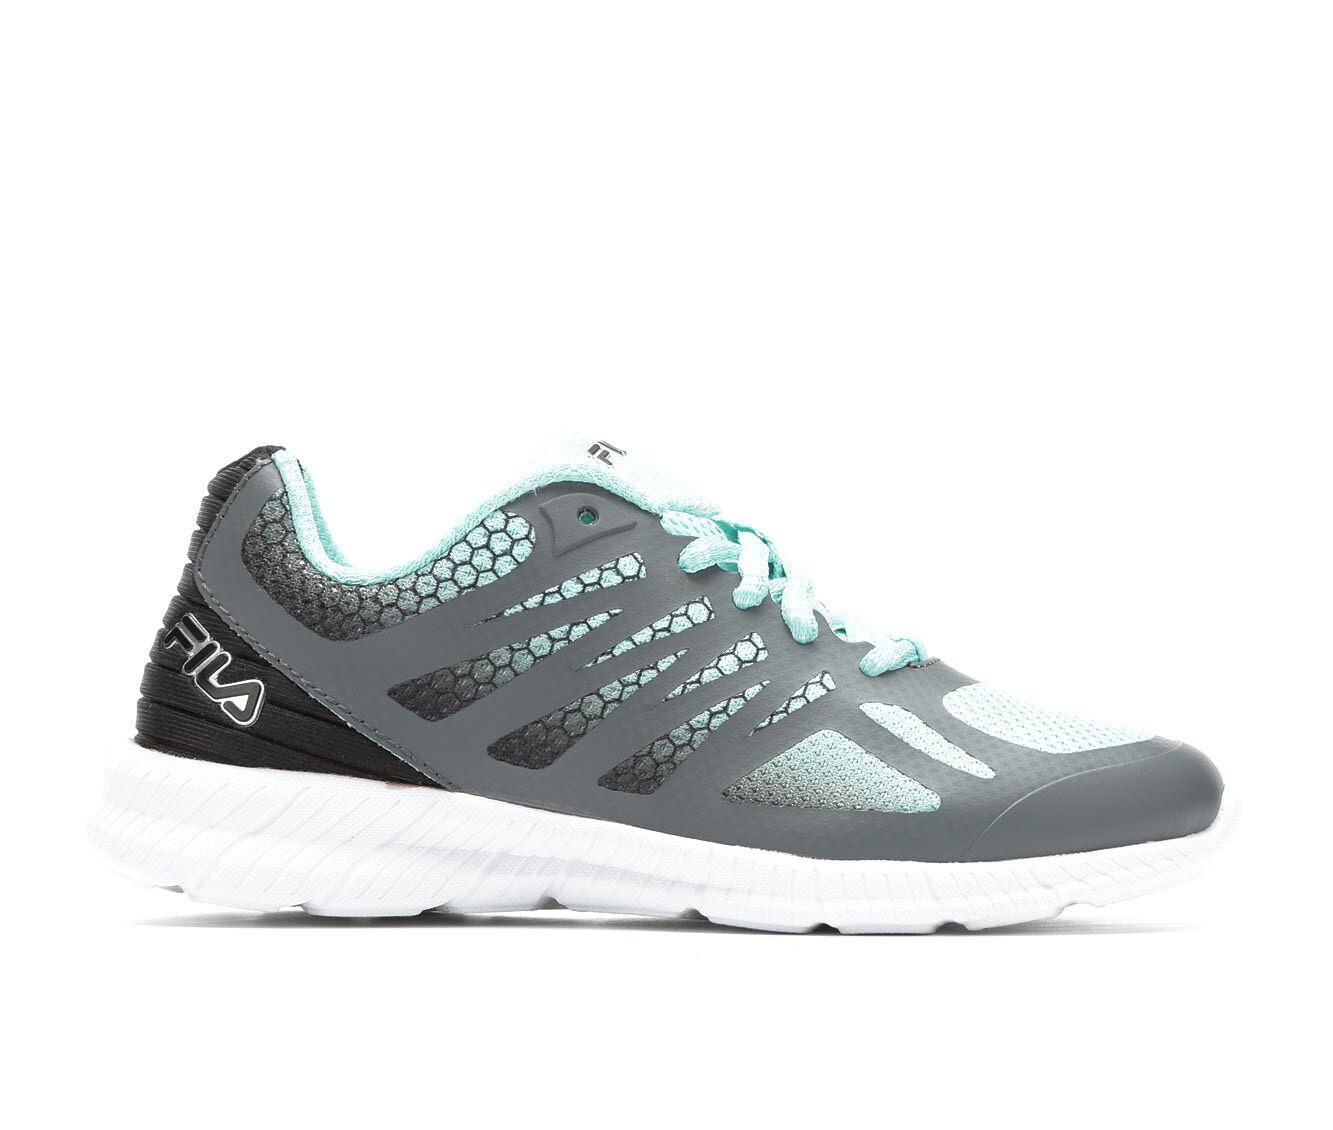 fila shoes 49943 zip code